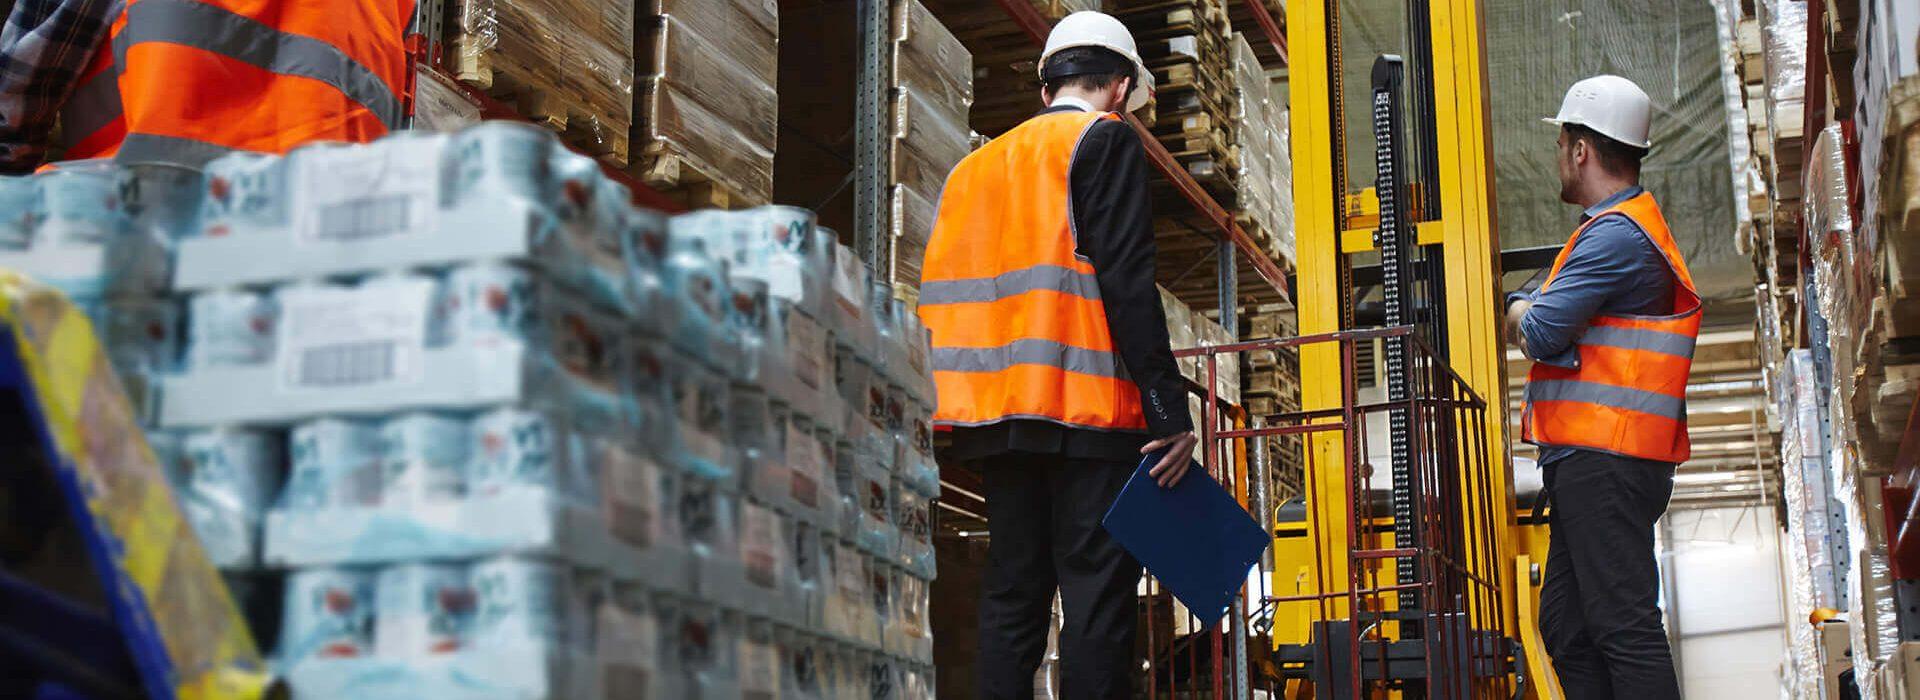 Ware Housing - Blitz Logistics